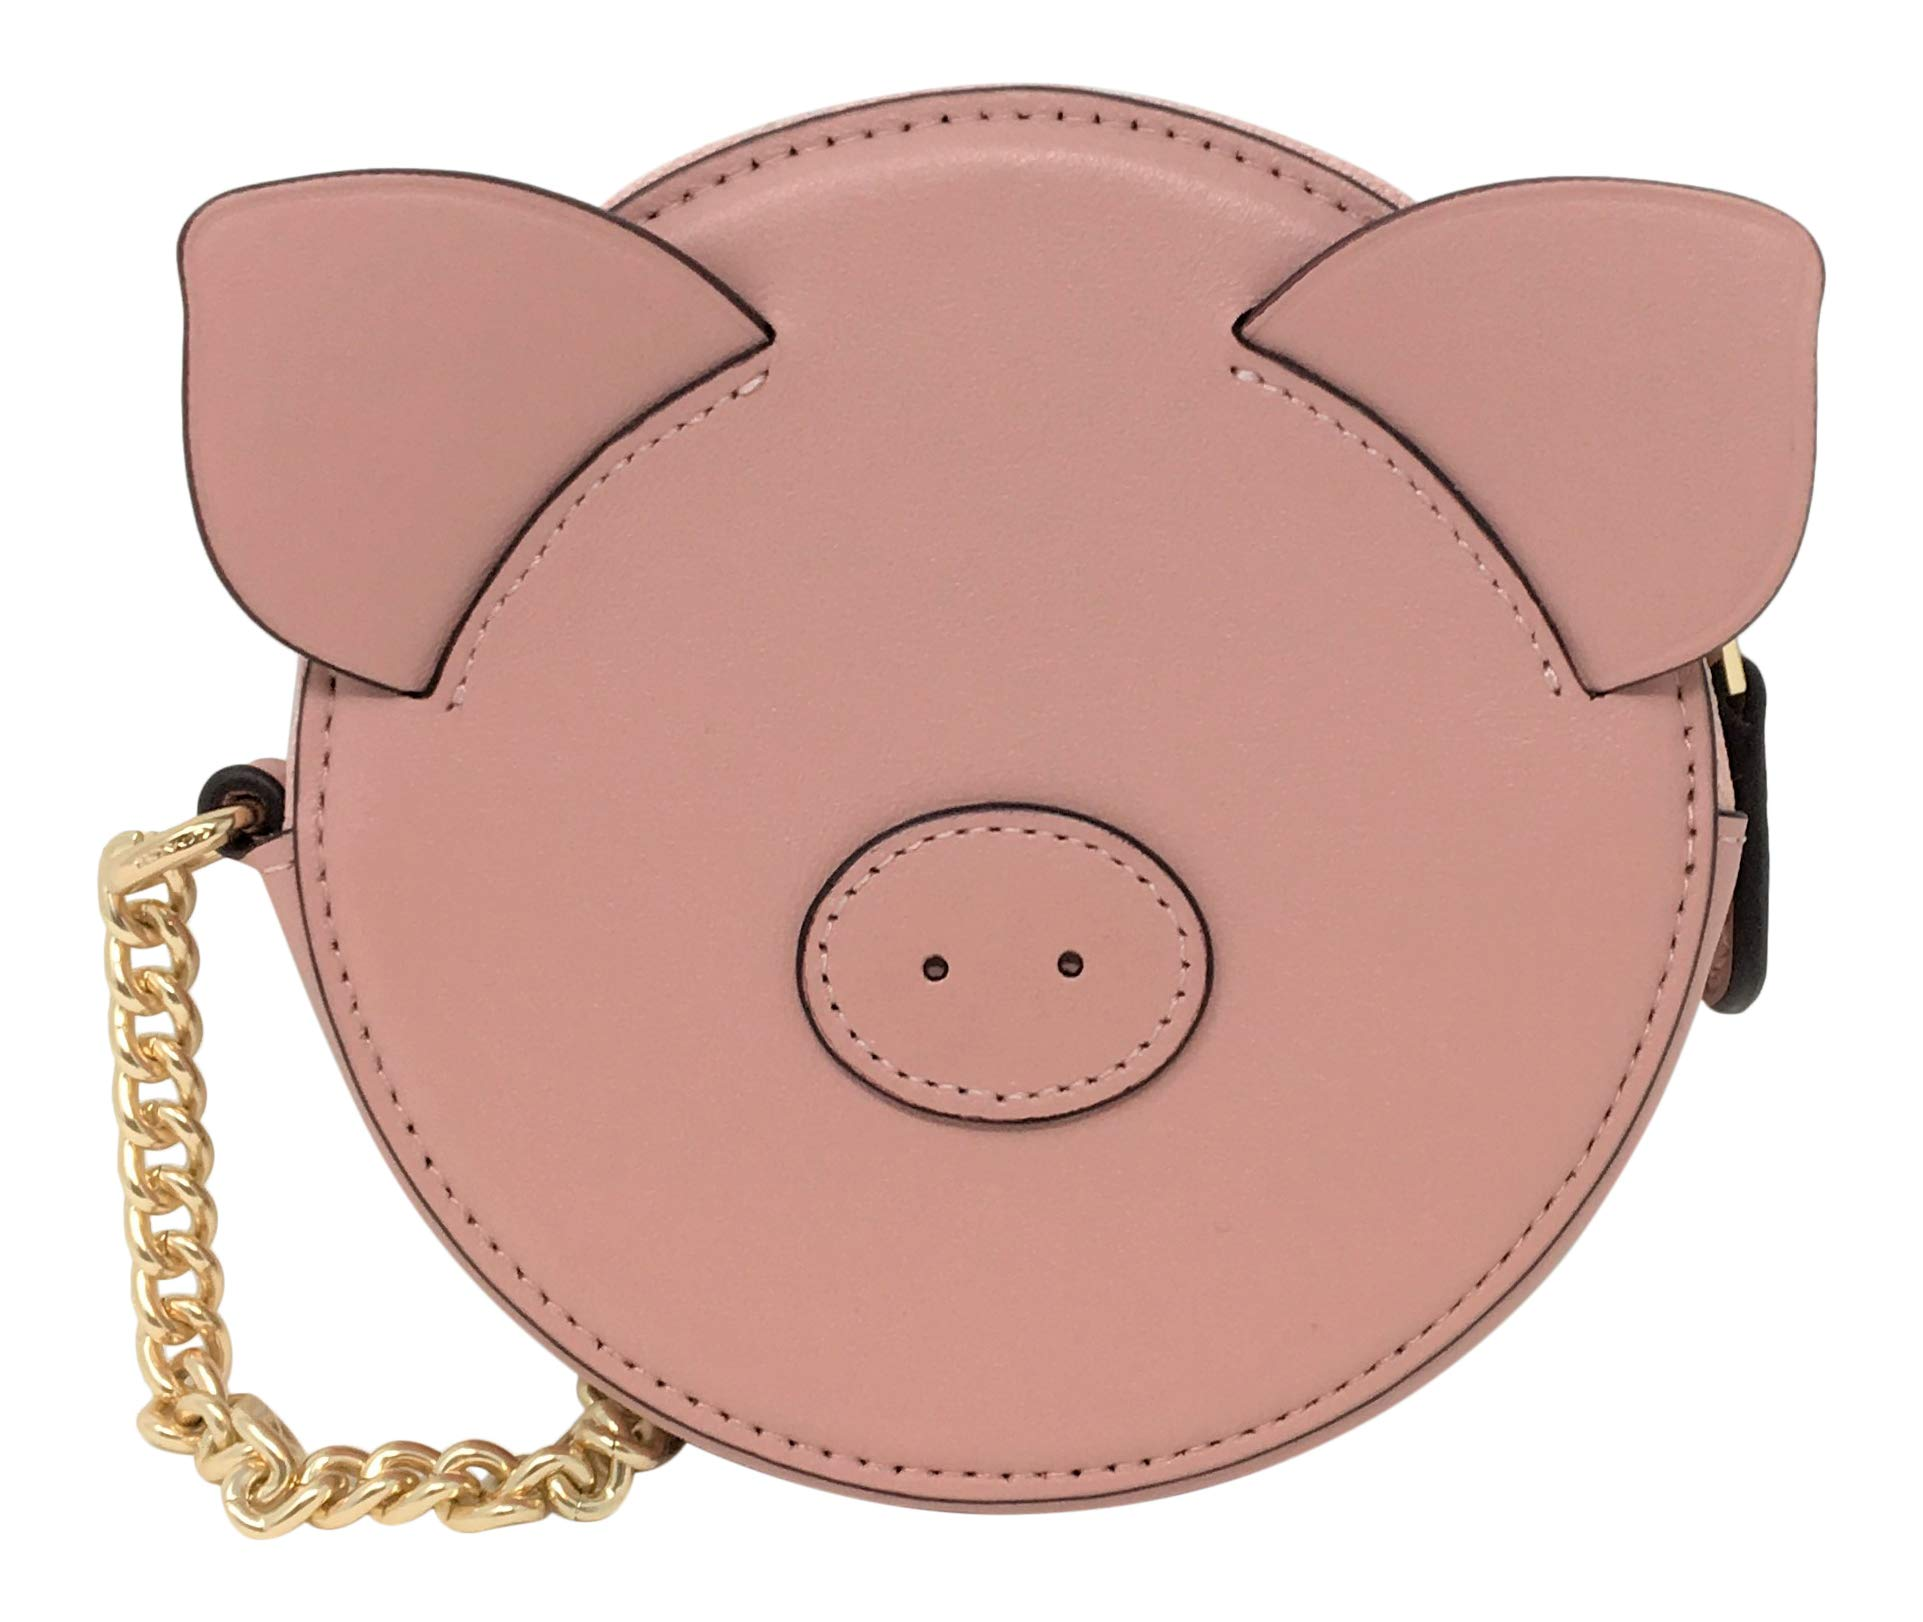 Coach Lunar New Year Pig Coin Case F53619 Pink